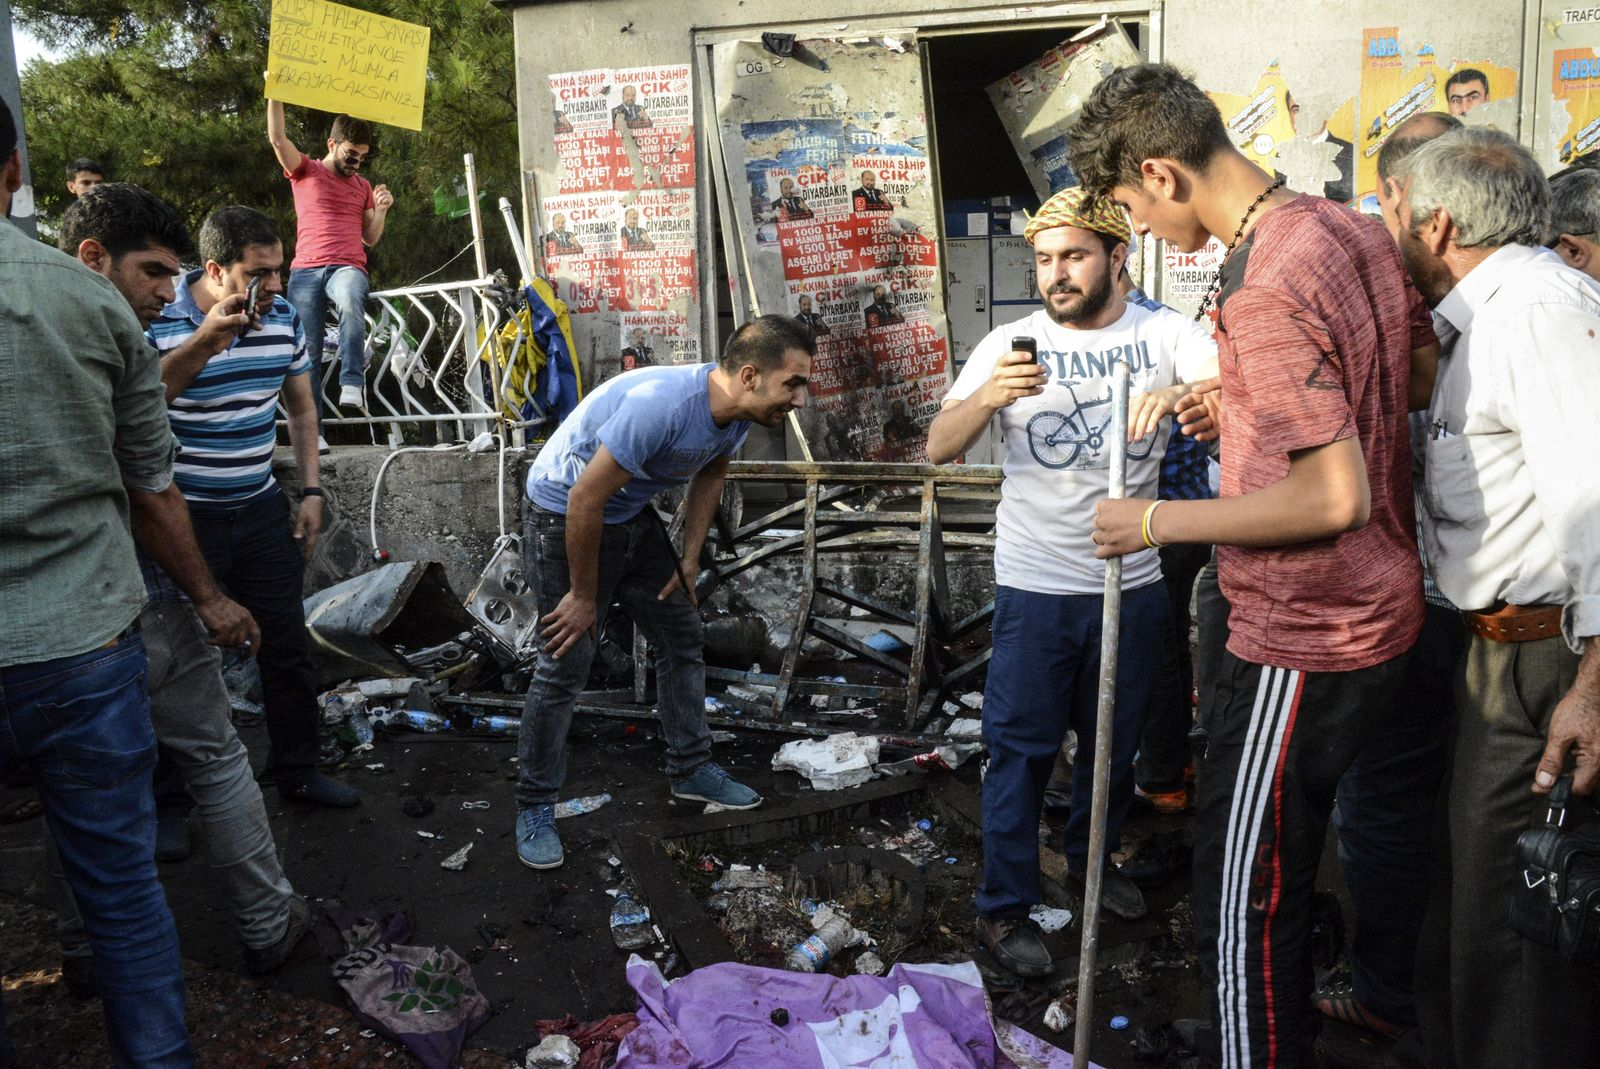 Türkei/ Diyarbakir/ Anschlag